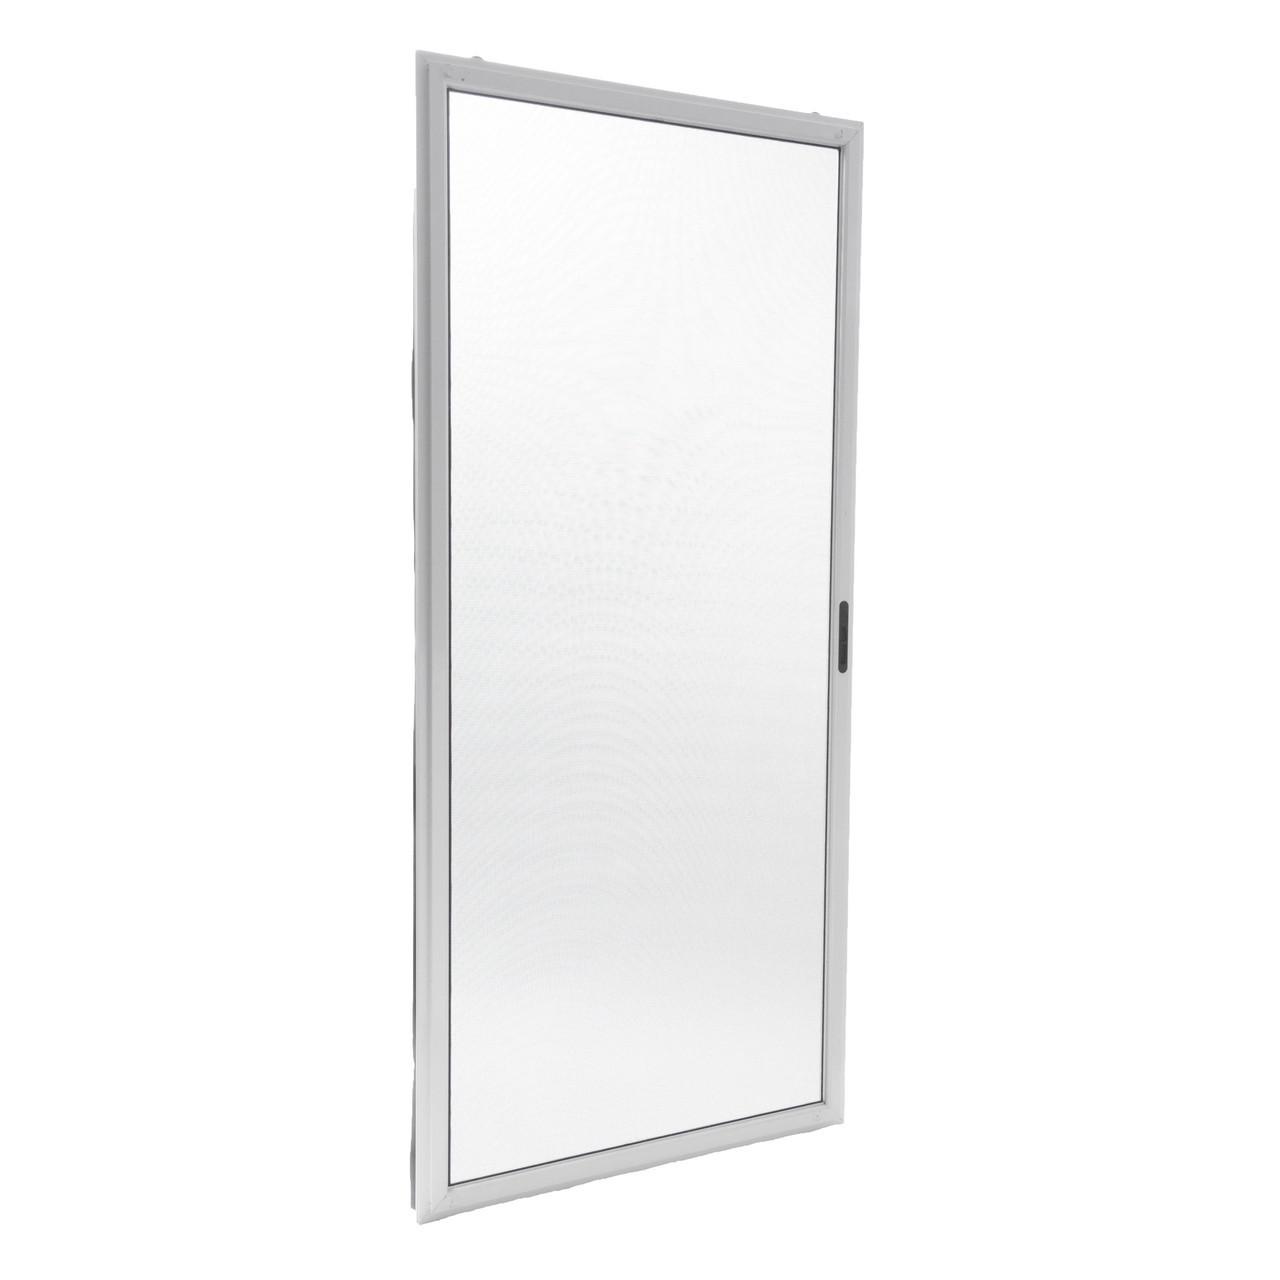 hercules sliding screen door assembled